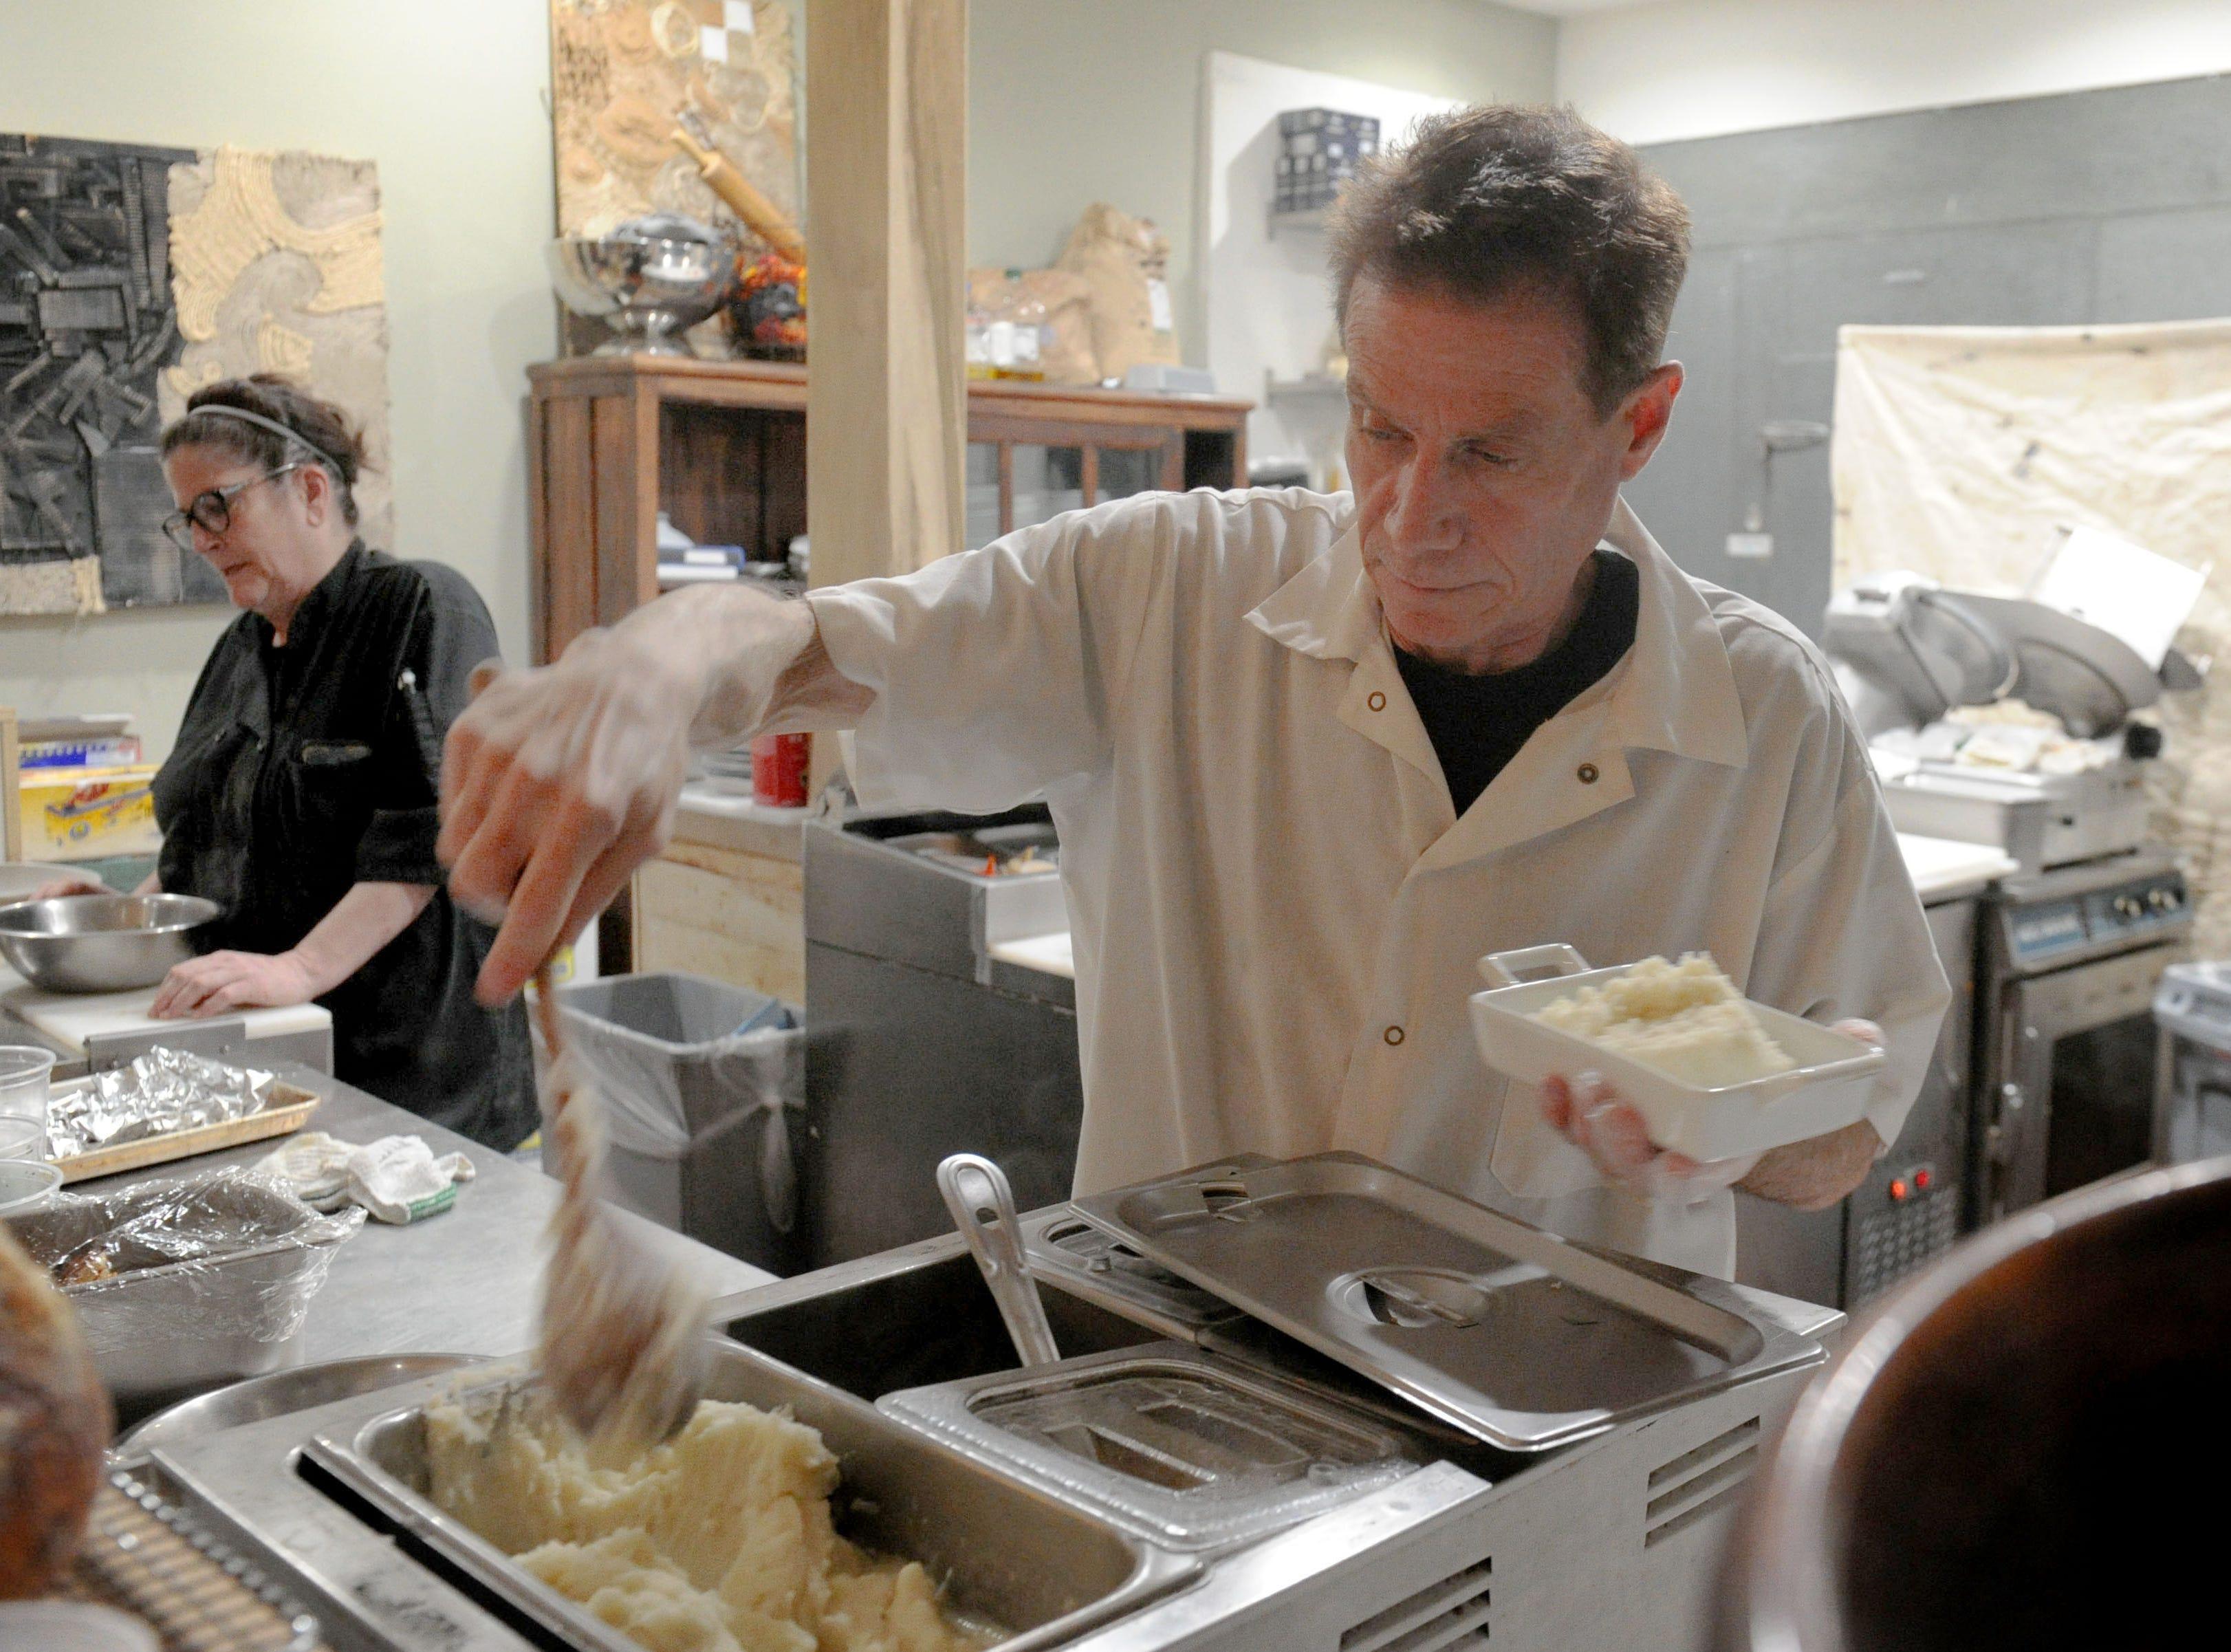 Rick Rosenblum, cook at the Decker Kitchen in Westlake Village, serves mashed potatoes.